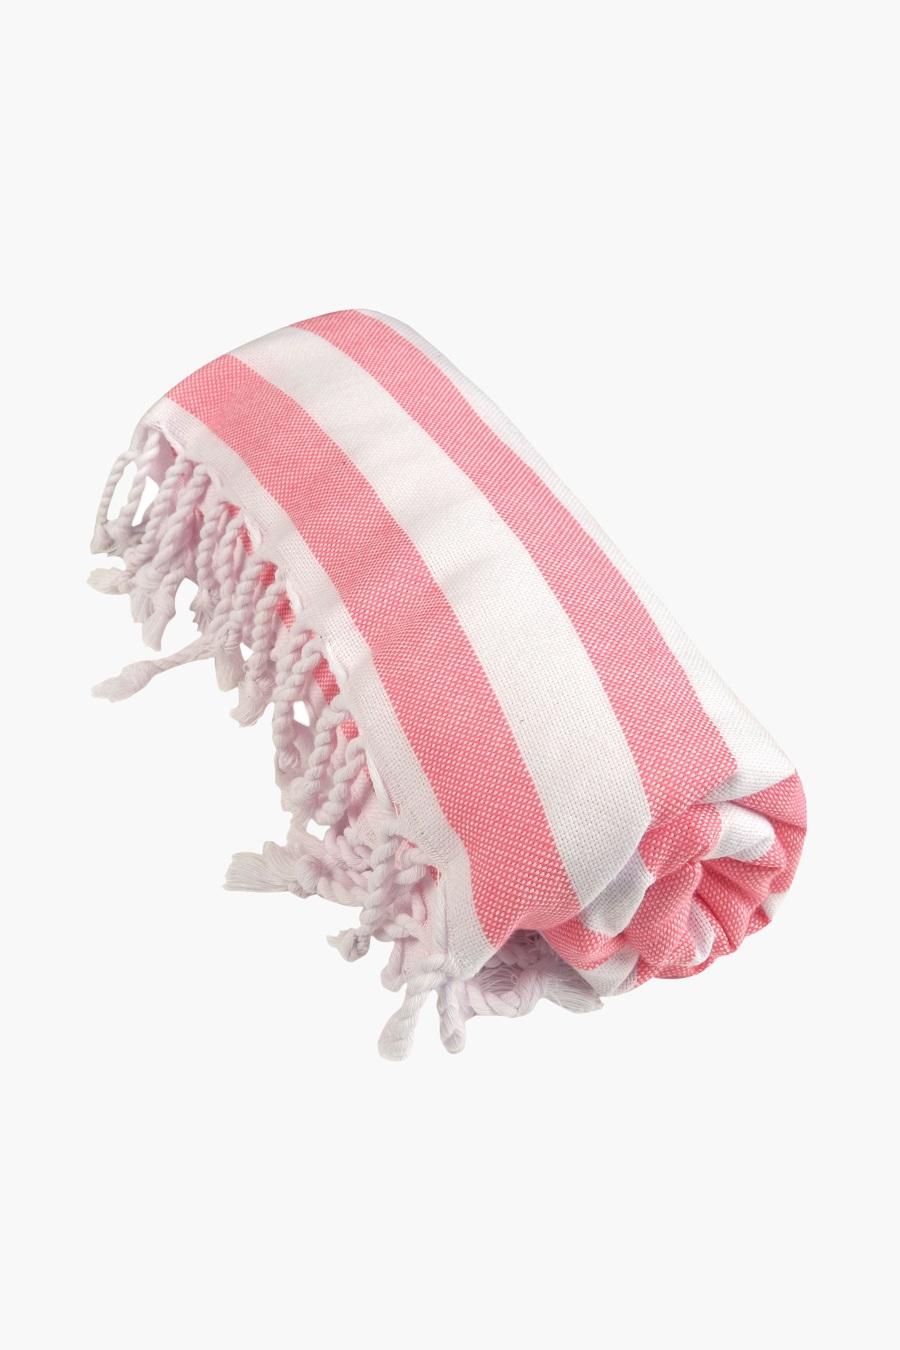 SEASALT CLOTHING - INCREDIBLY USEFUL TOWEL IN WARE BEGONIA - £20